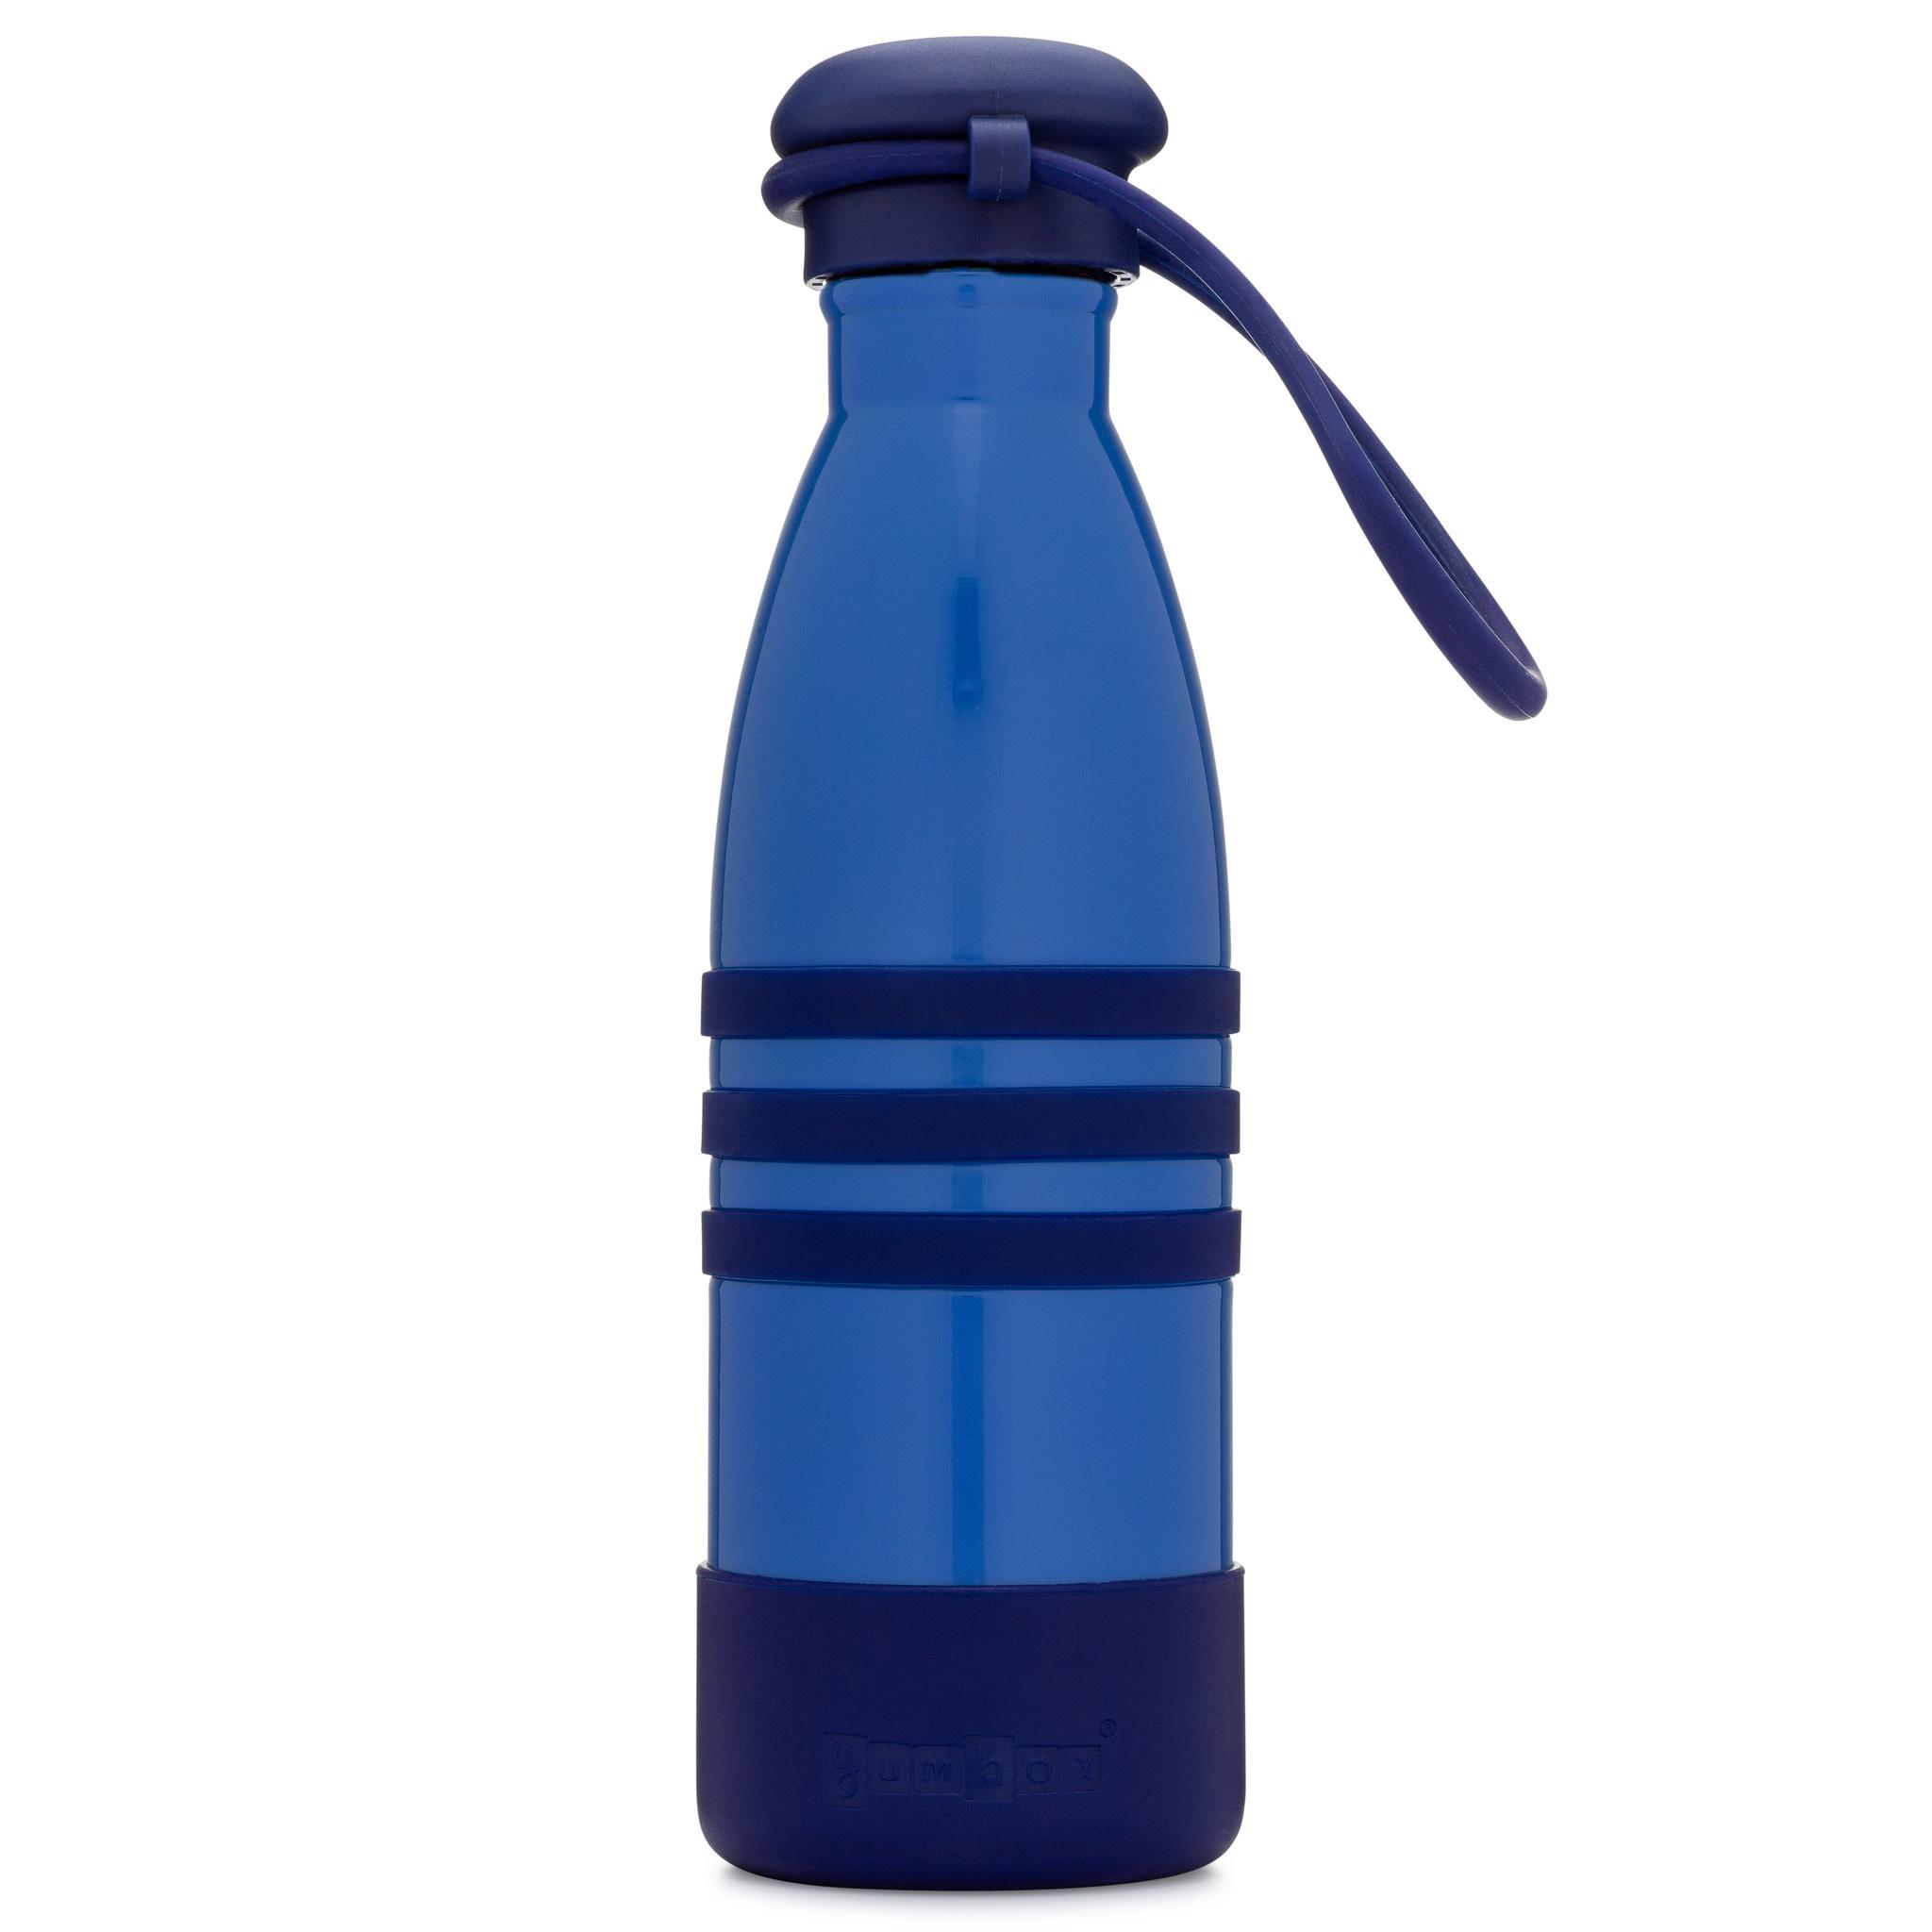 Yumbox Aqua thermo bottle Blue-3